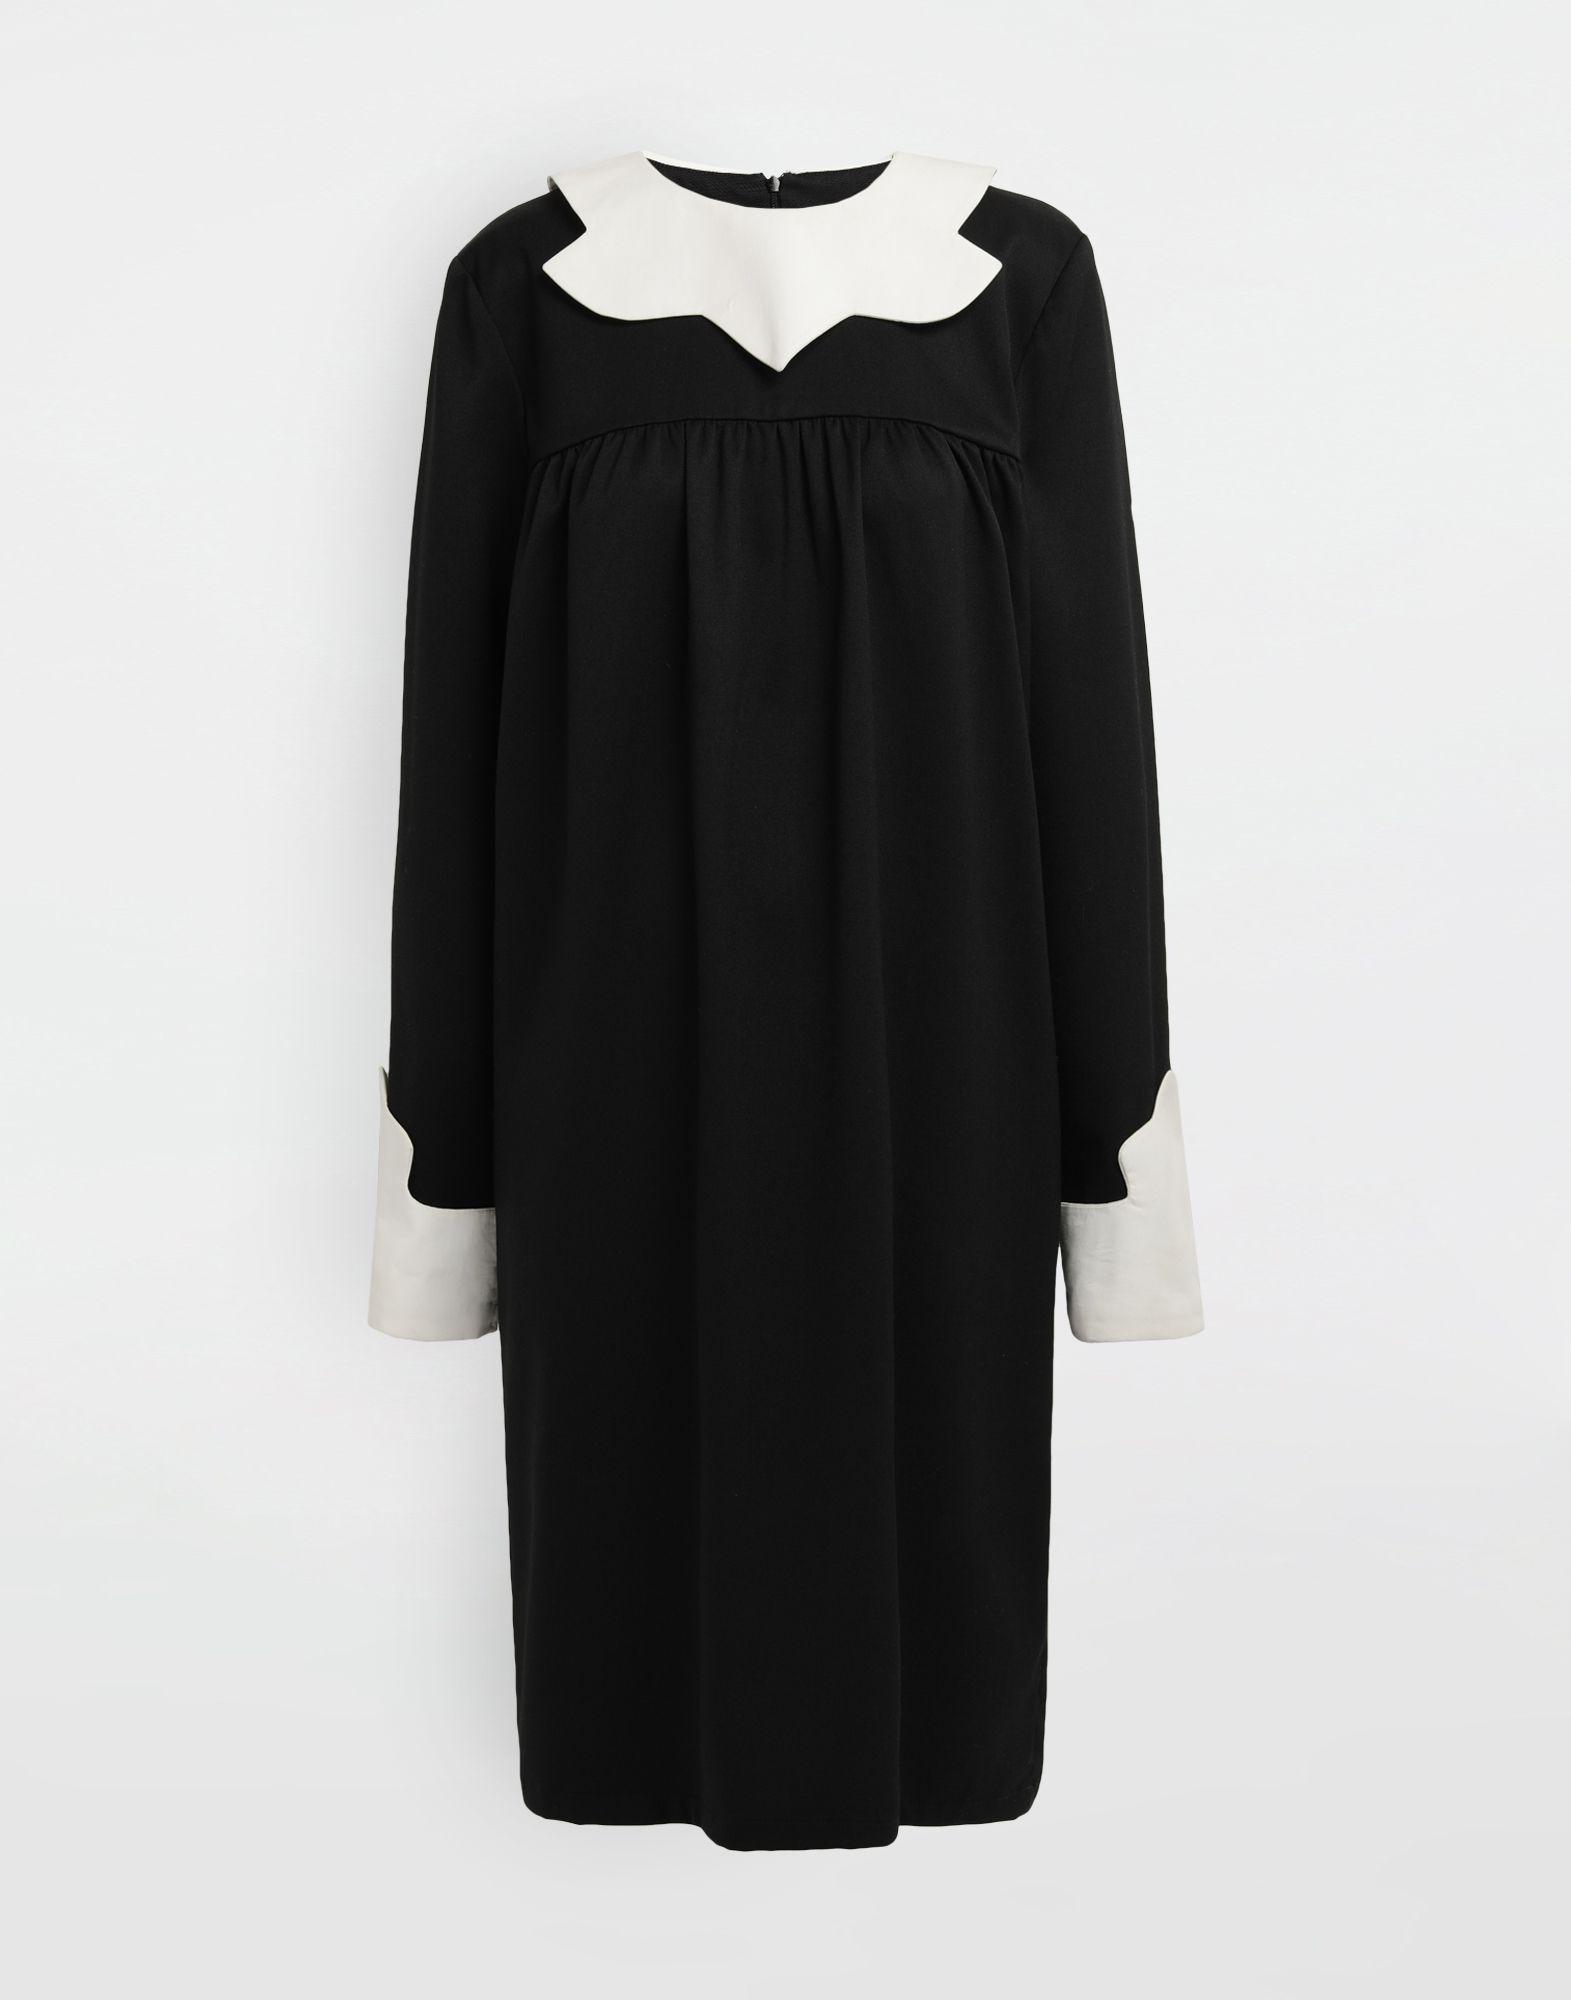 MM6 MAISON MARGIELA School uniform midi dress 3/4 length dress Woman f